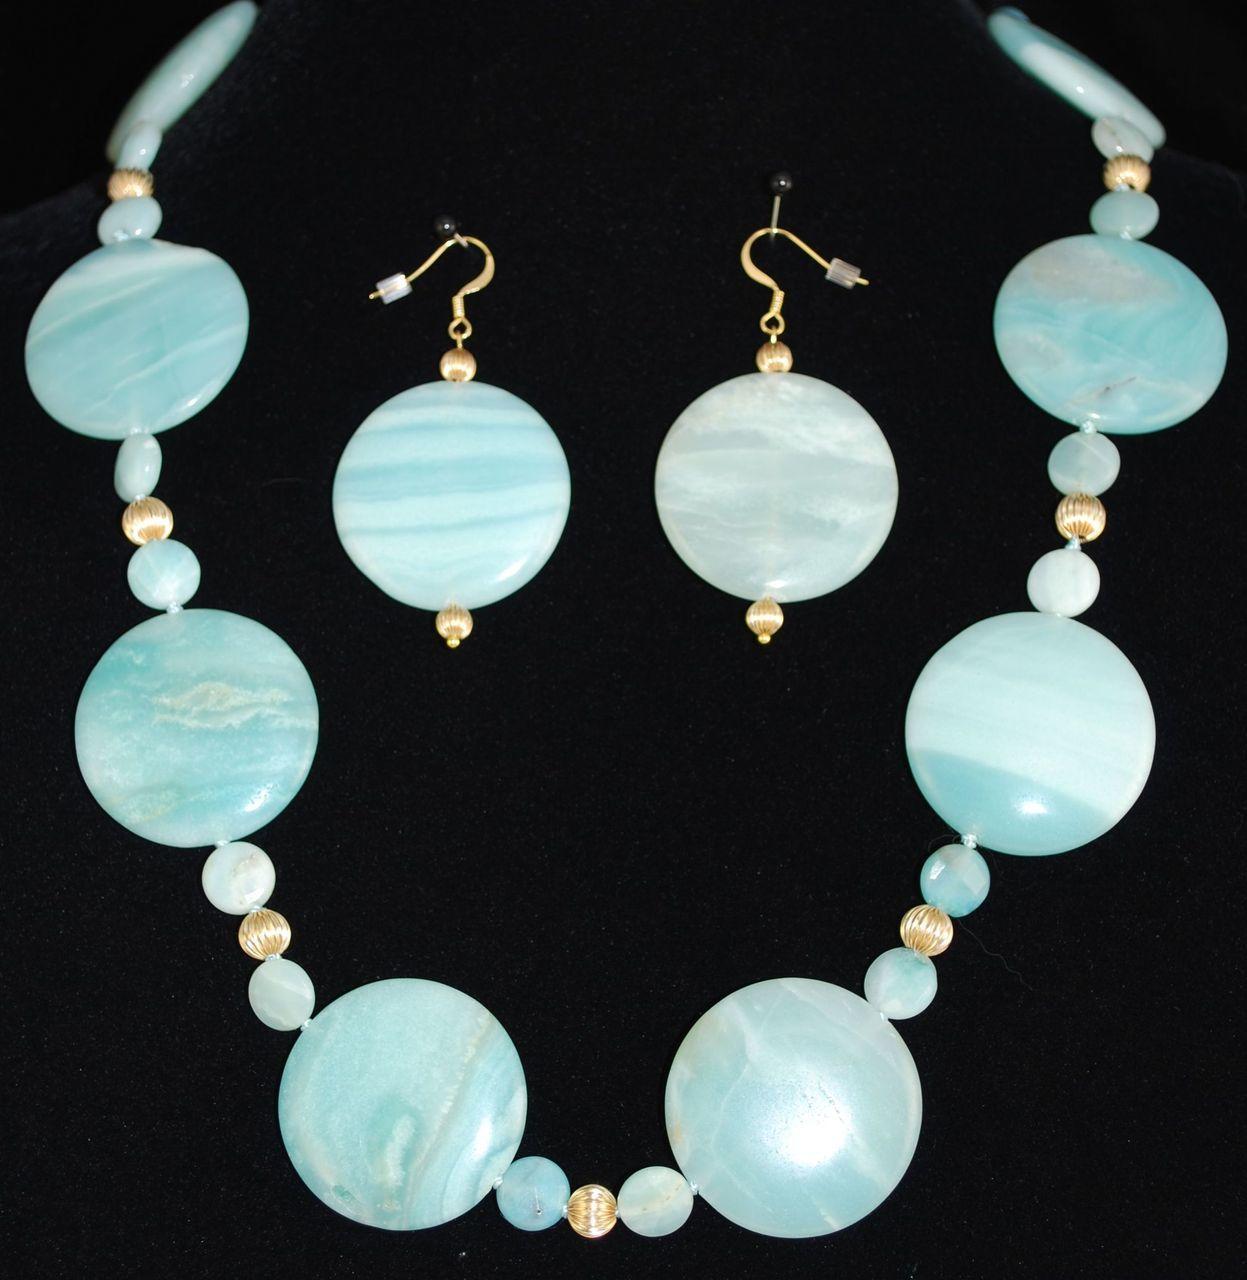 Enchanting Jewelry Creations image 30